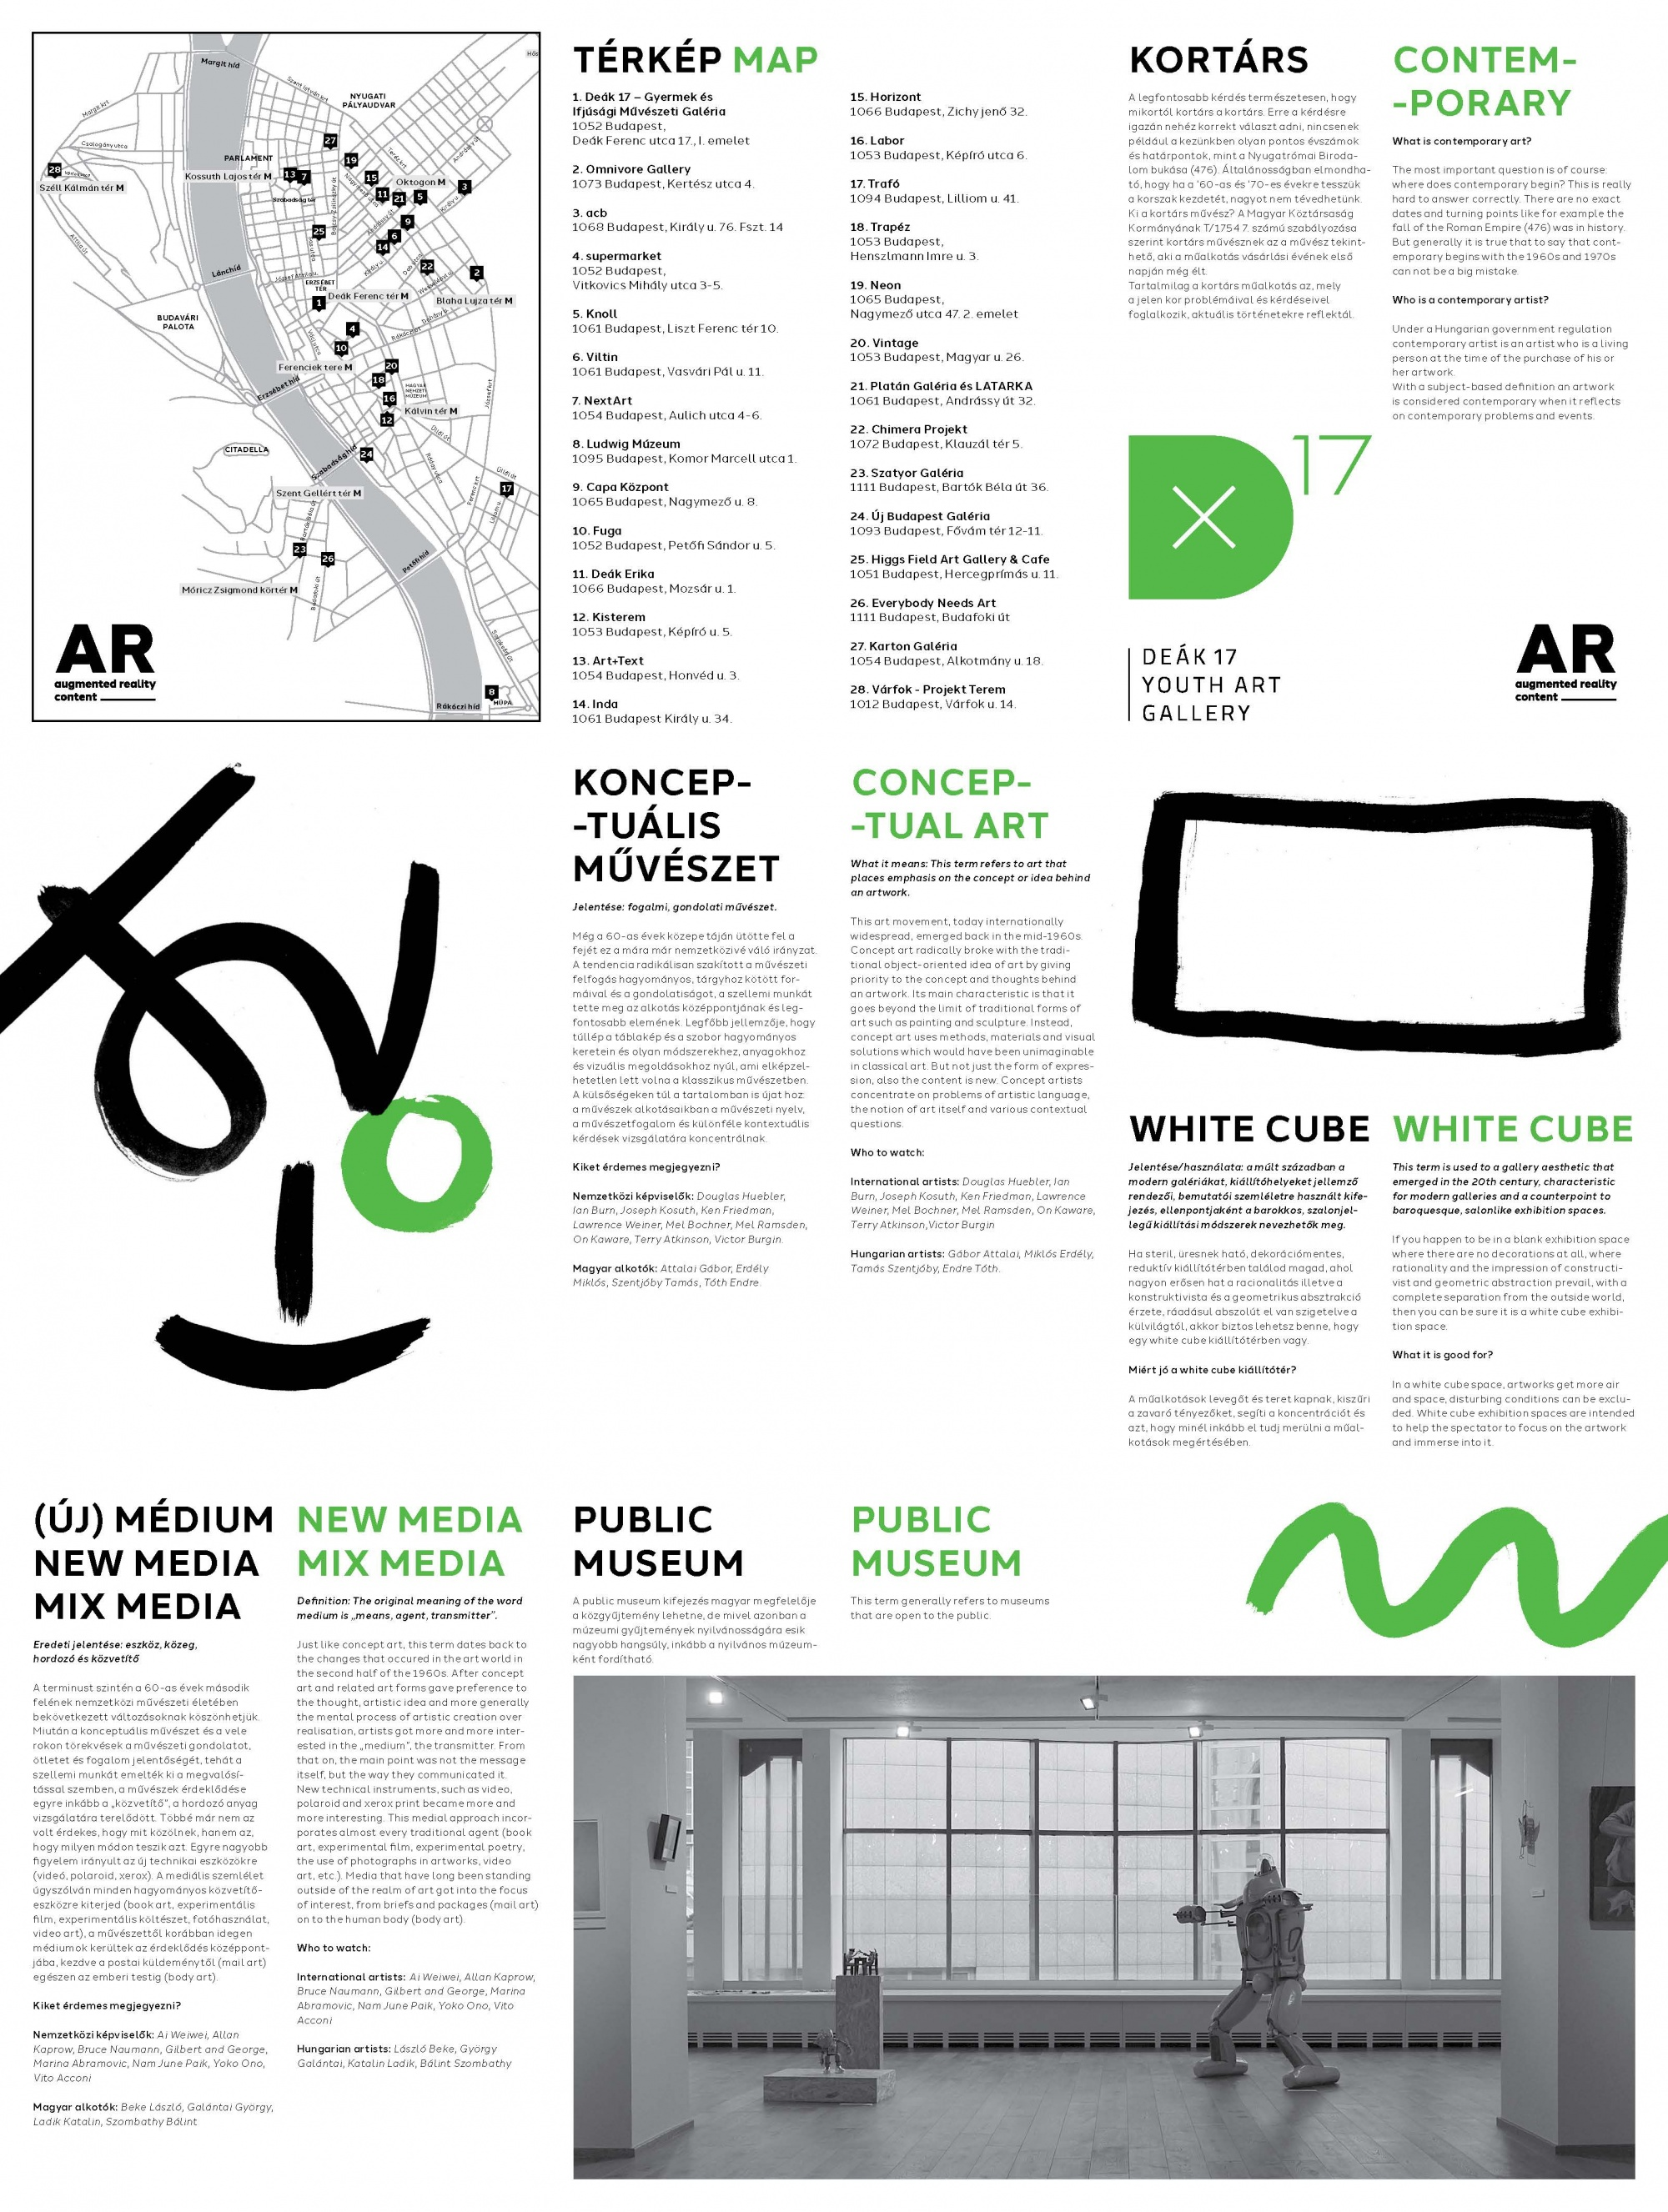 artlocator_kortars_kepzomuveszeti_vezeto_reduced_Page_1